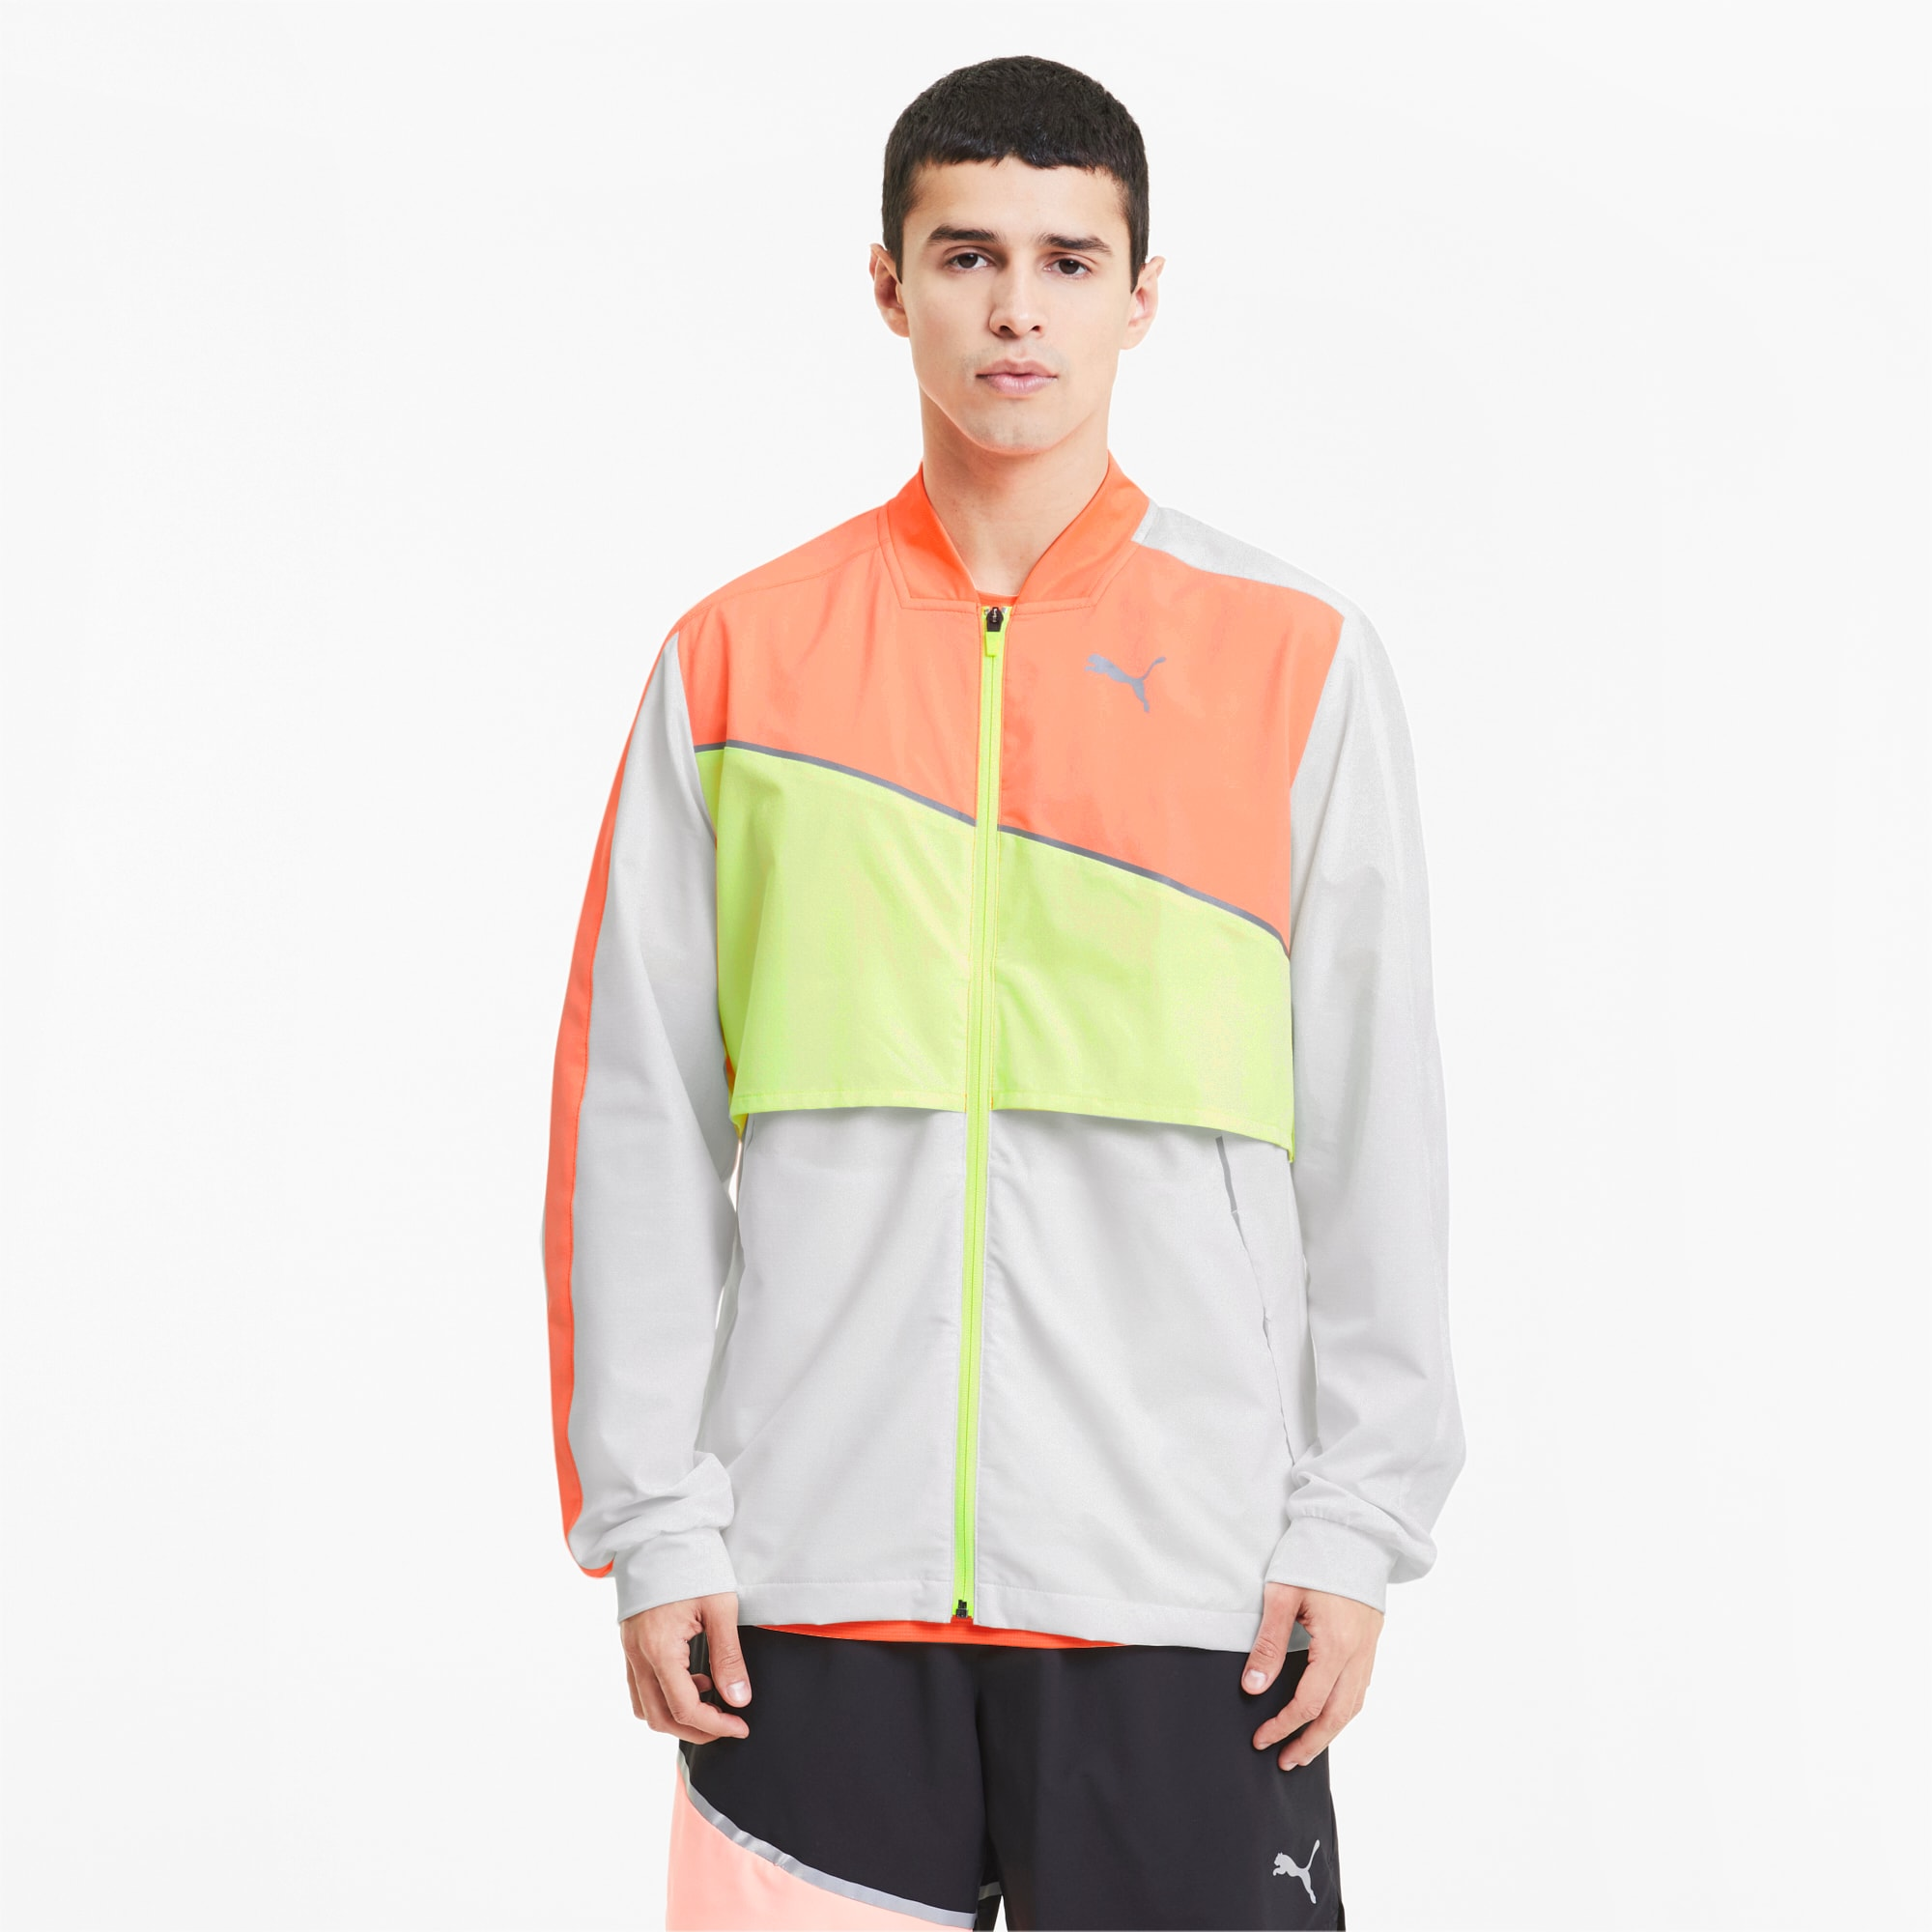 Ultra Woven dryCELL Reflective Tec Men's Running Jacket